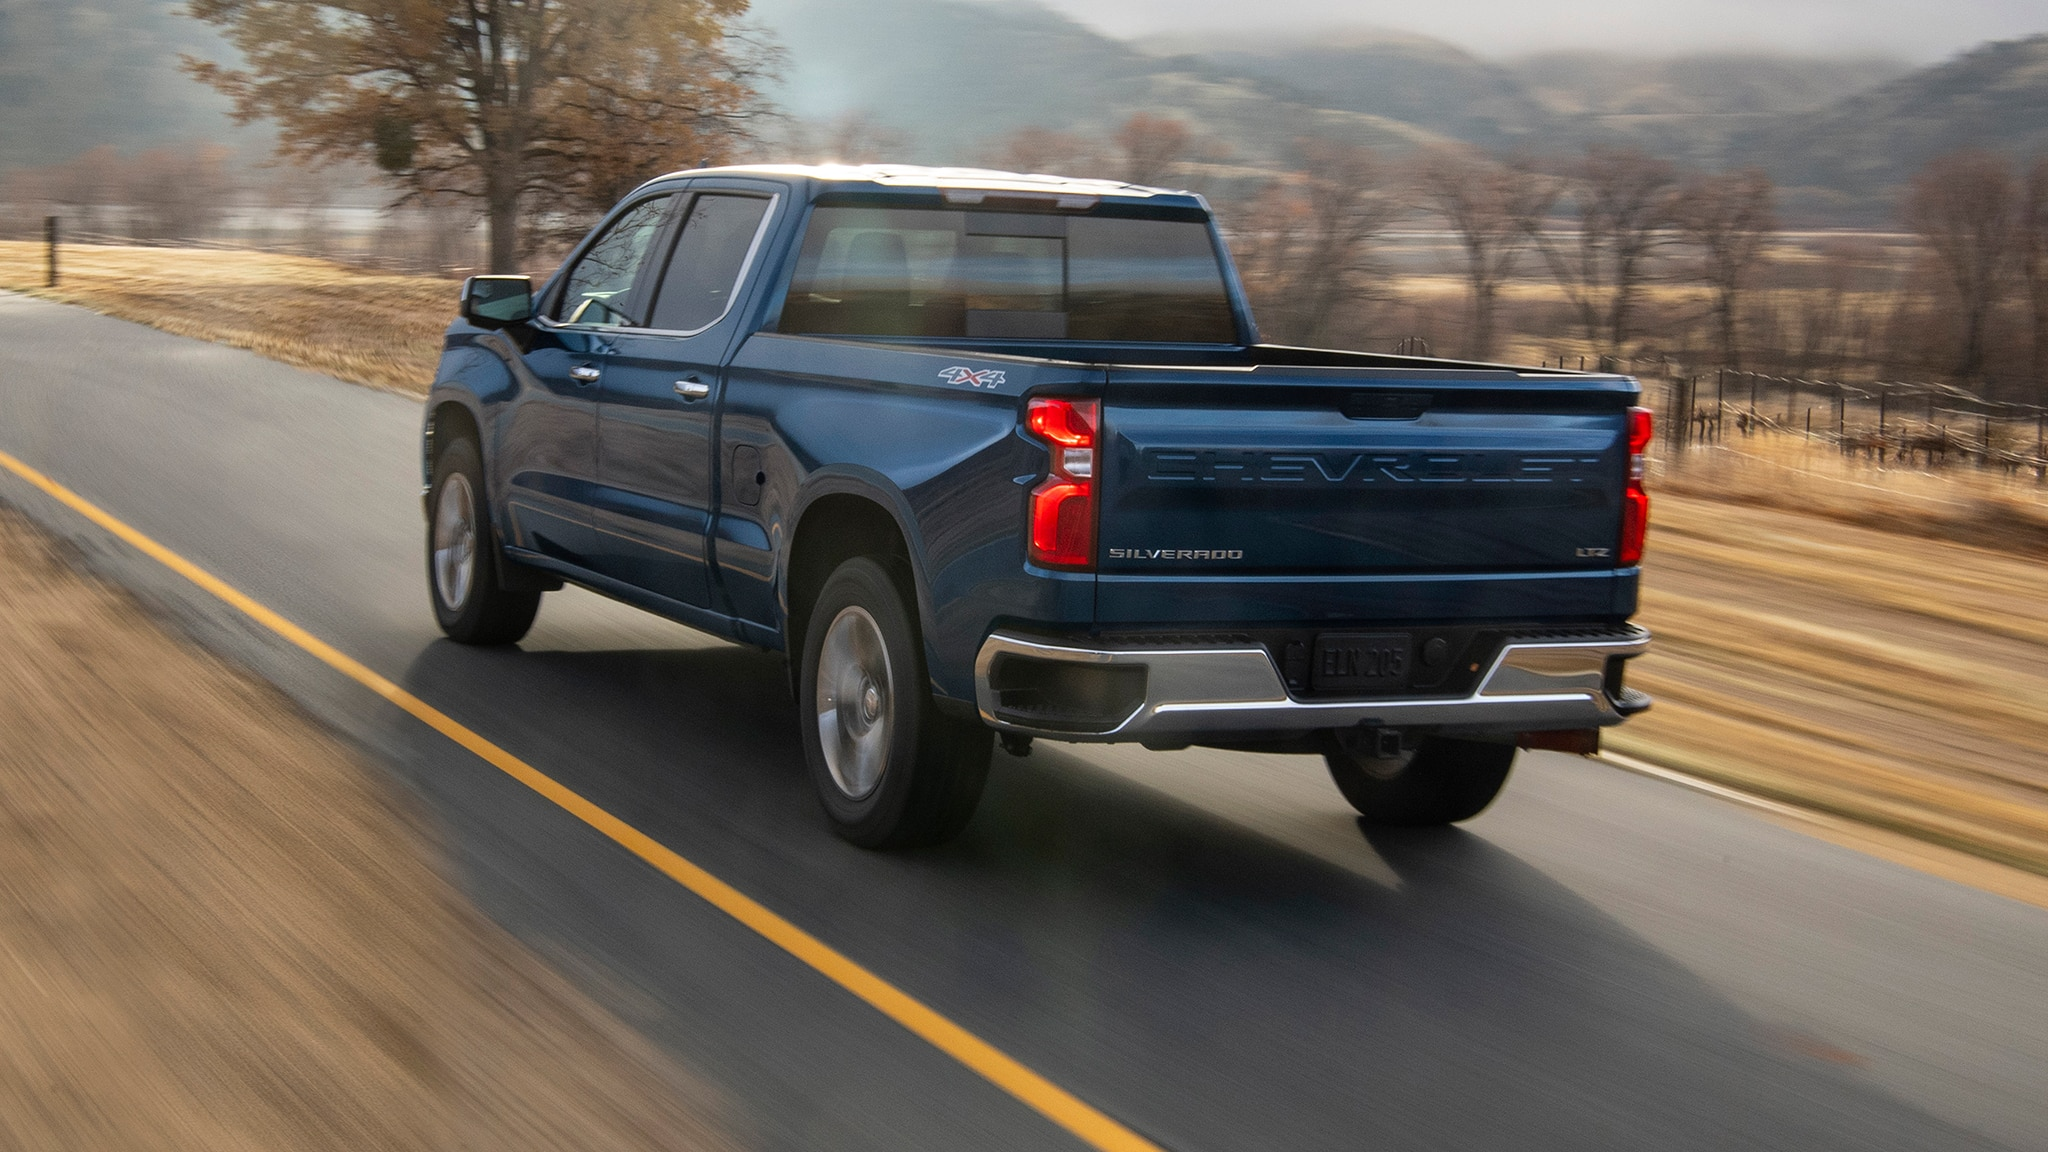 2020 chevrolet silverado 1500 diesel first drive review